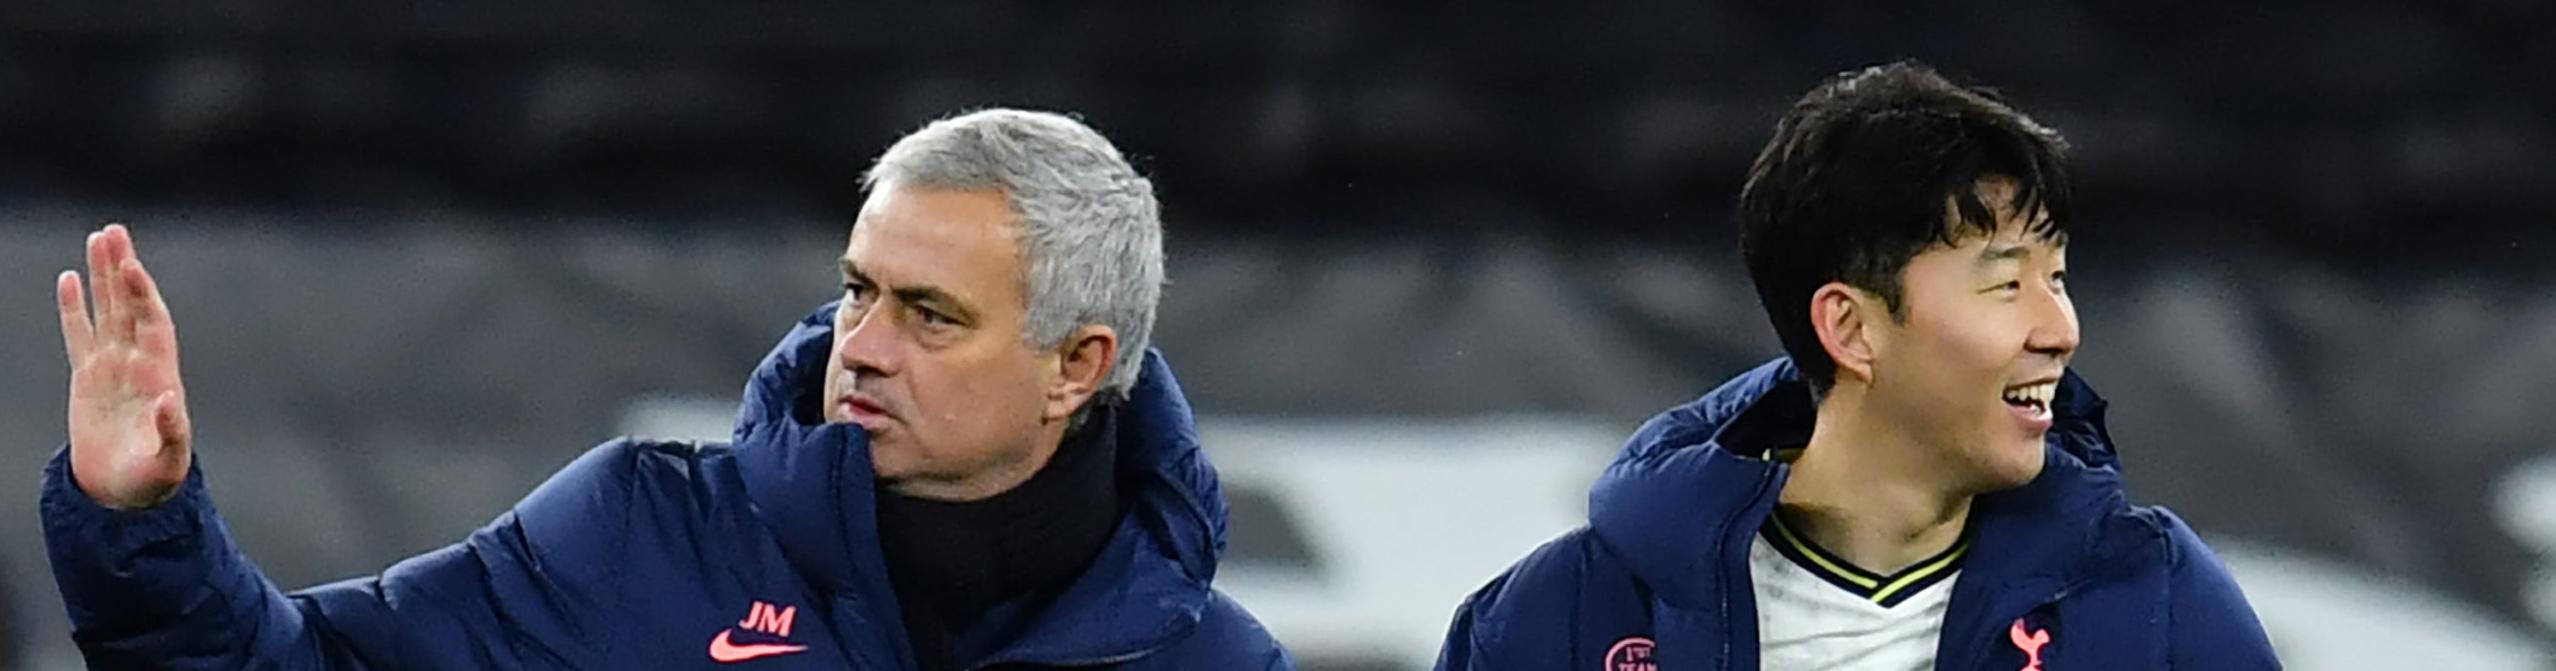 Pronostici Premier League: tanti testacoda, ma occhio a Tottenham-Chelsea